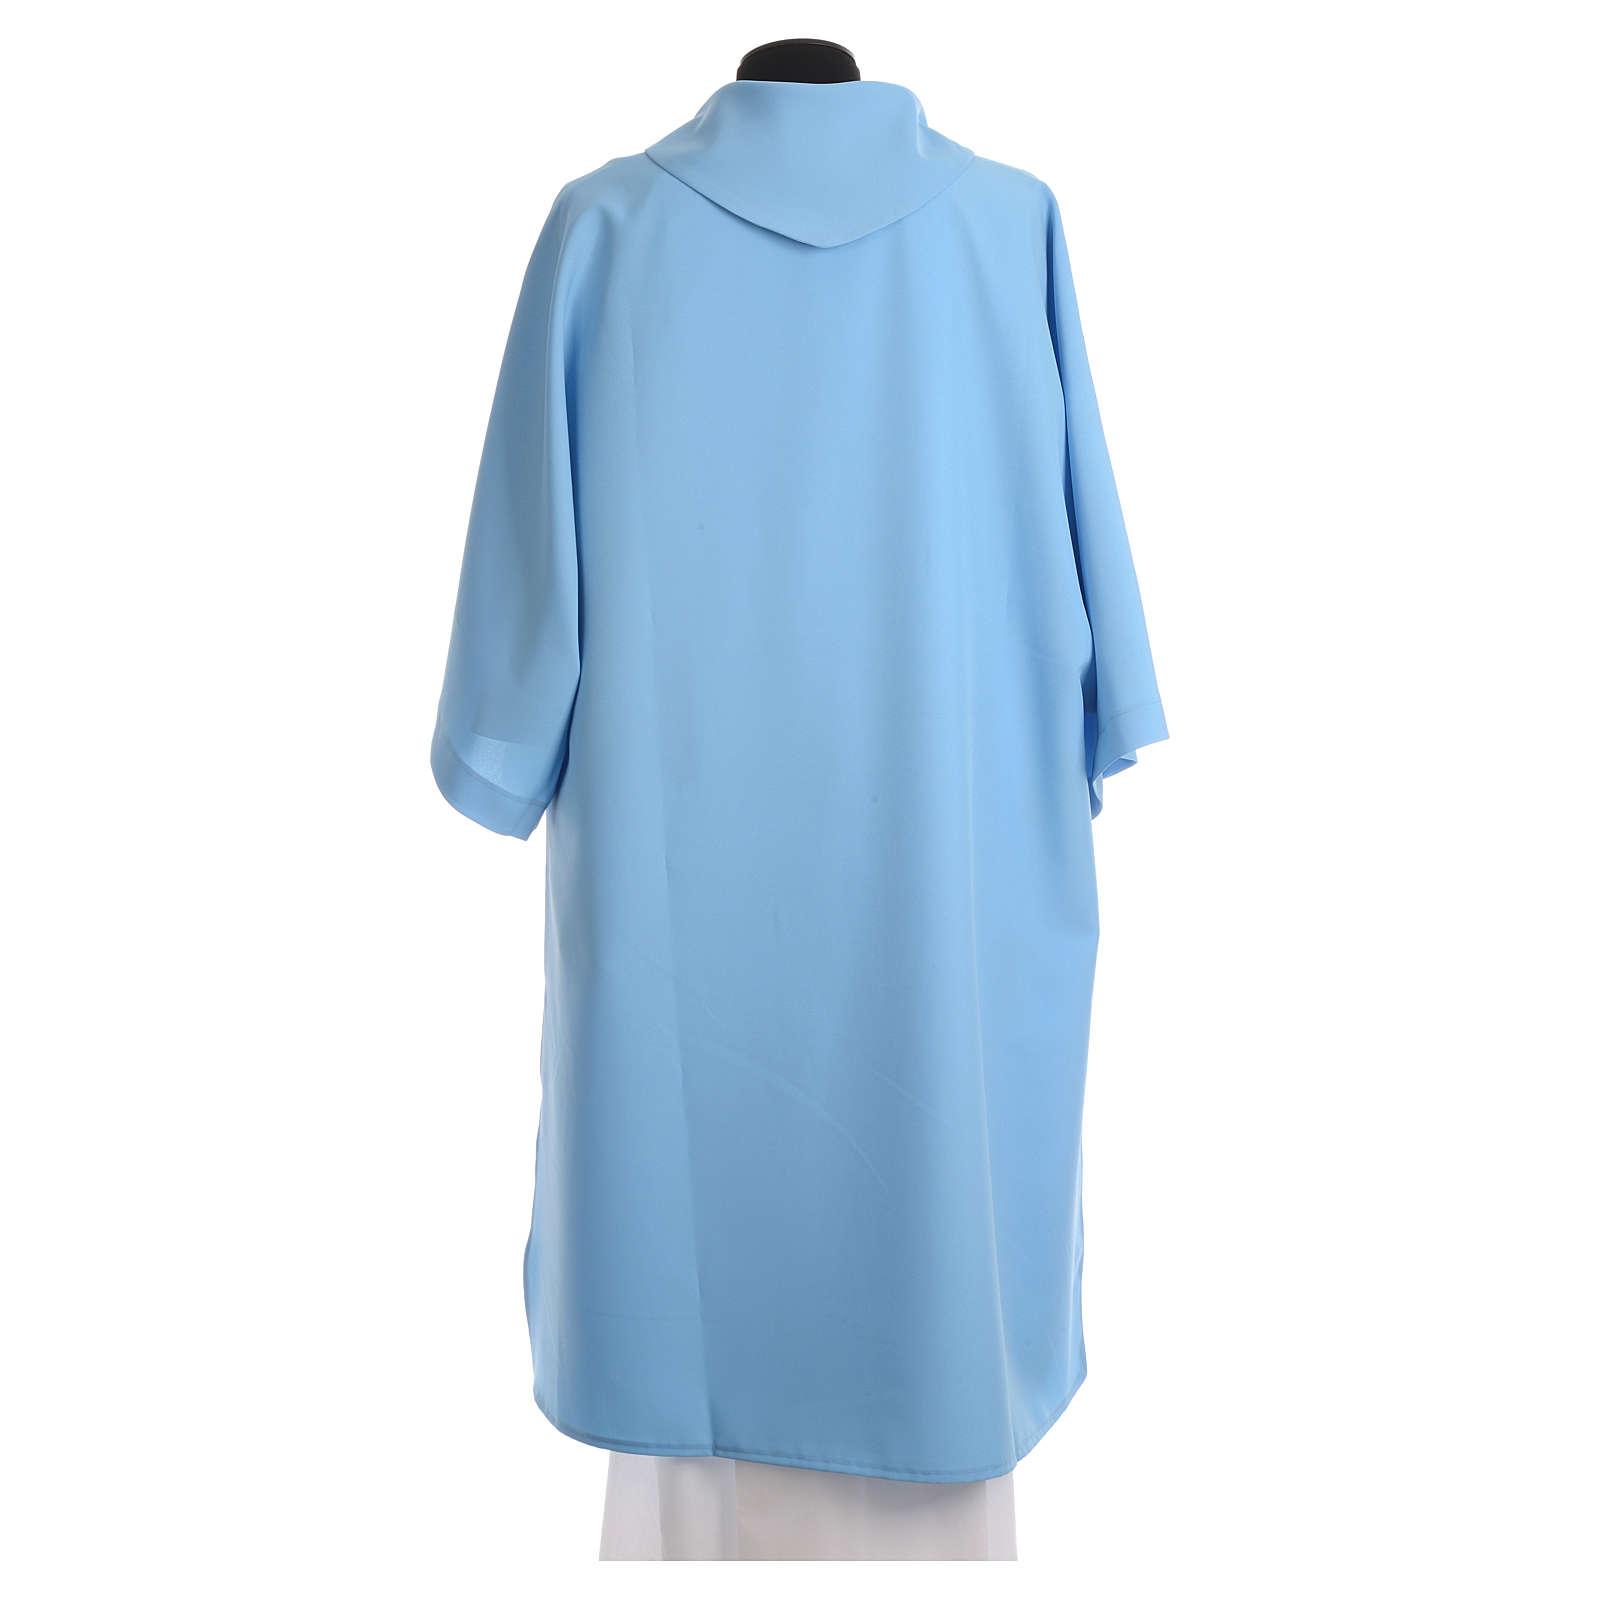 Dalmatik aus hellblauen Polyester 4